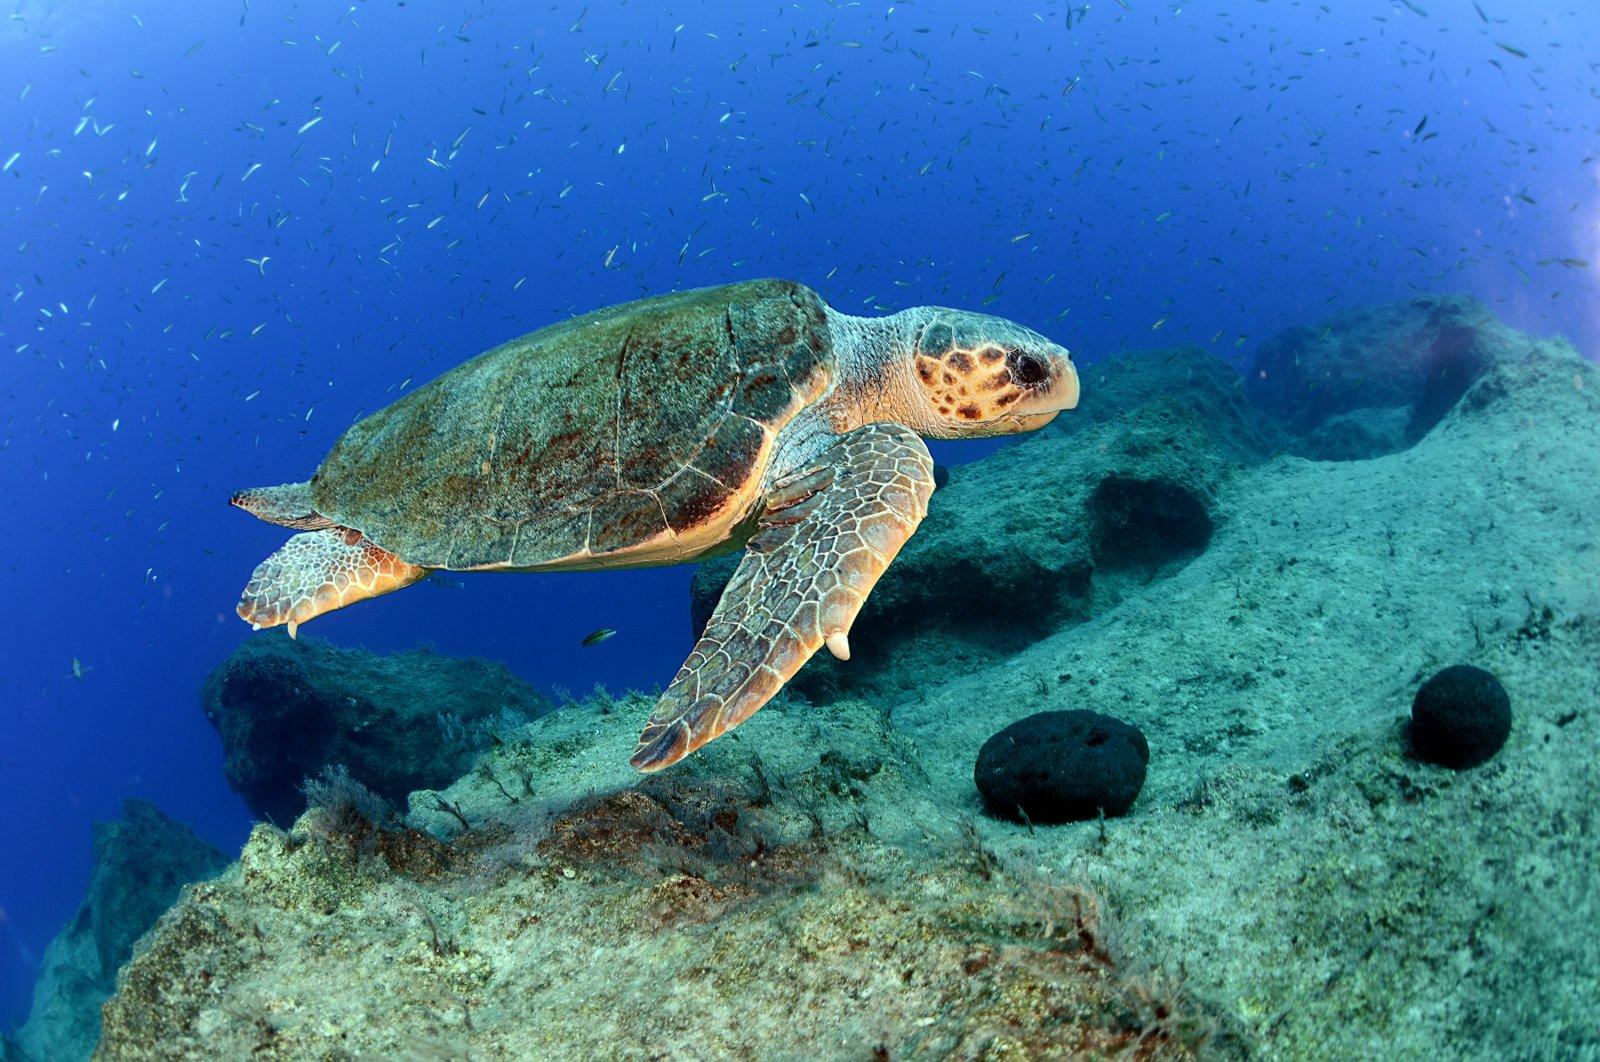 A loggerhead sea turtle swims off the coast of Antalya, southern Turkey, June 6, 2021. (DHA PHOTO)